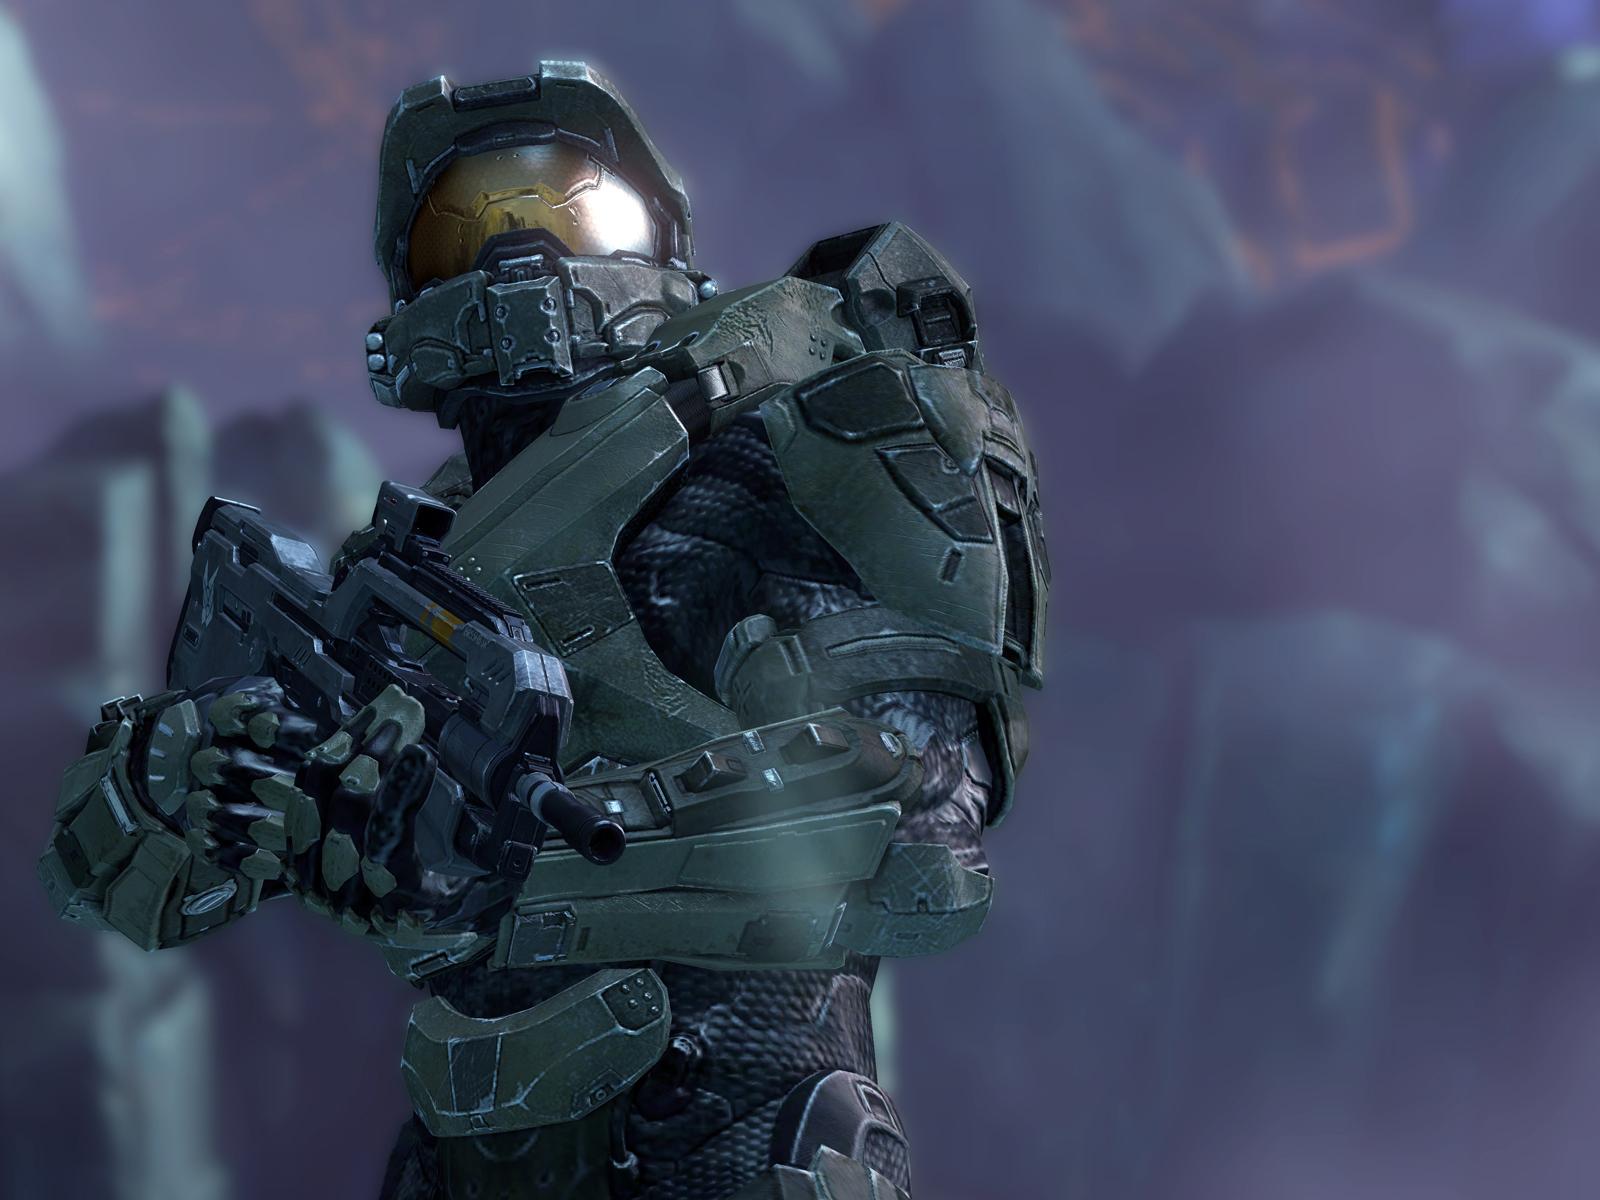 Halo-4-Master-Chief